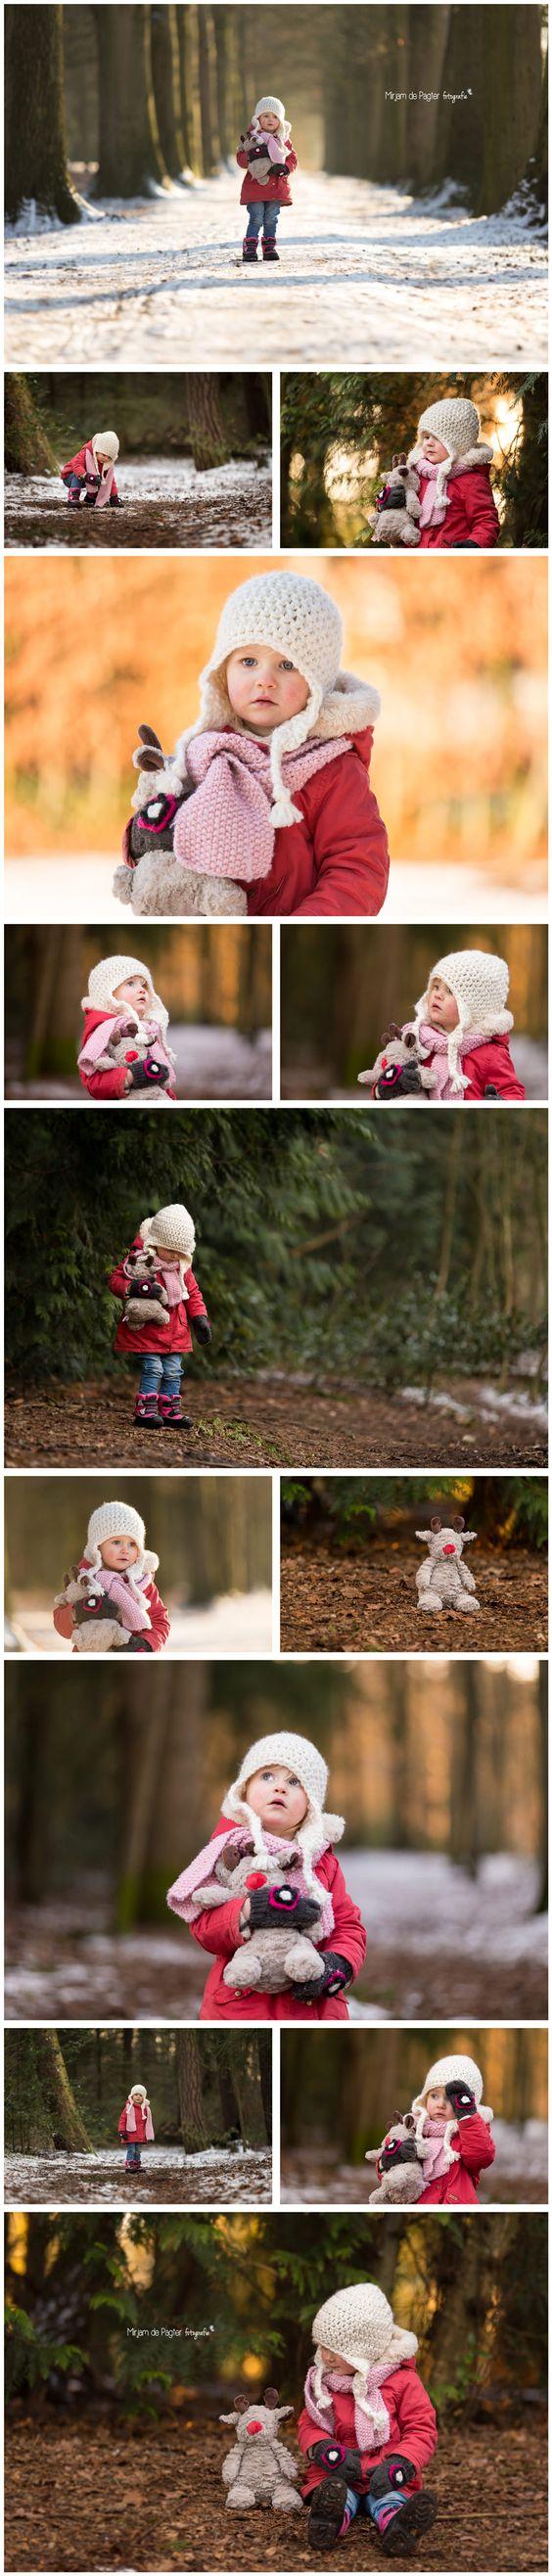 Winterse peuter fotoshoot in het bos ♡   http://mirjamdepagter.nl/fotoshoots-blog/peuter-in-het-winterbos/   Mirjam de Pagter Fotografie #kinderfotografie #peuter #winter #bos